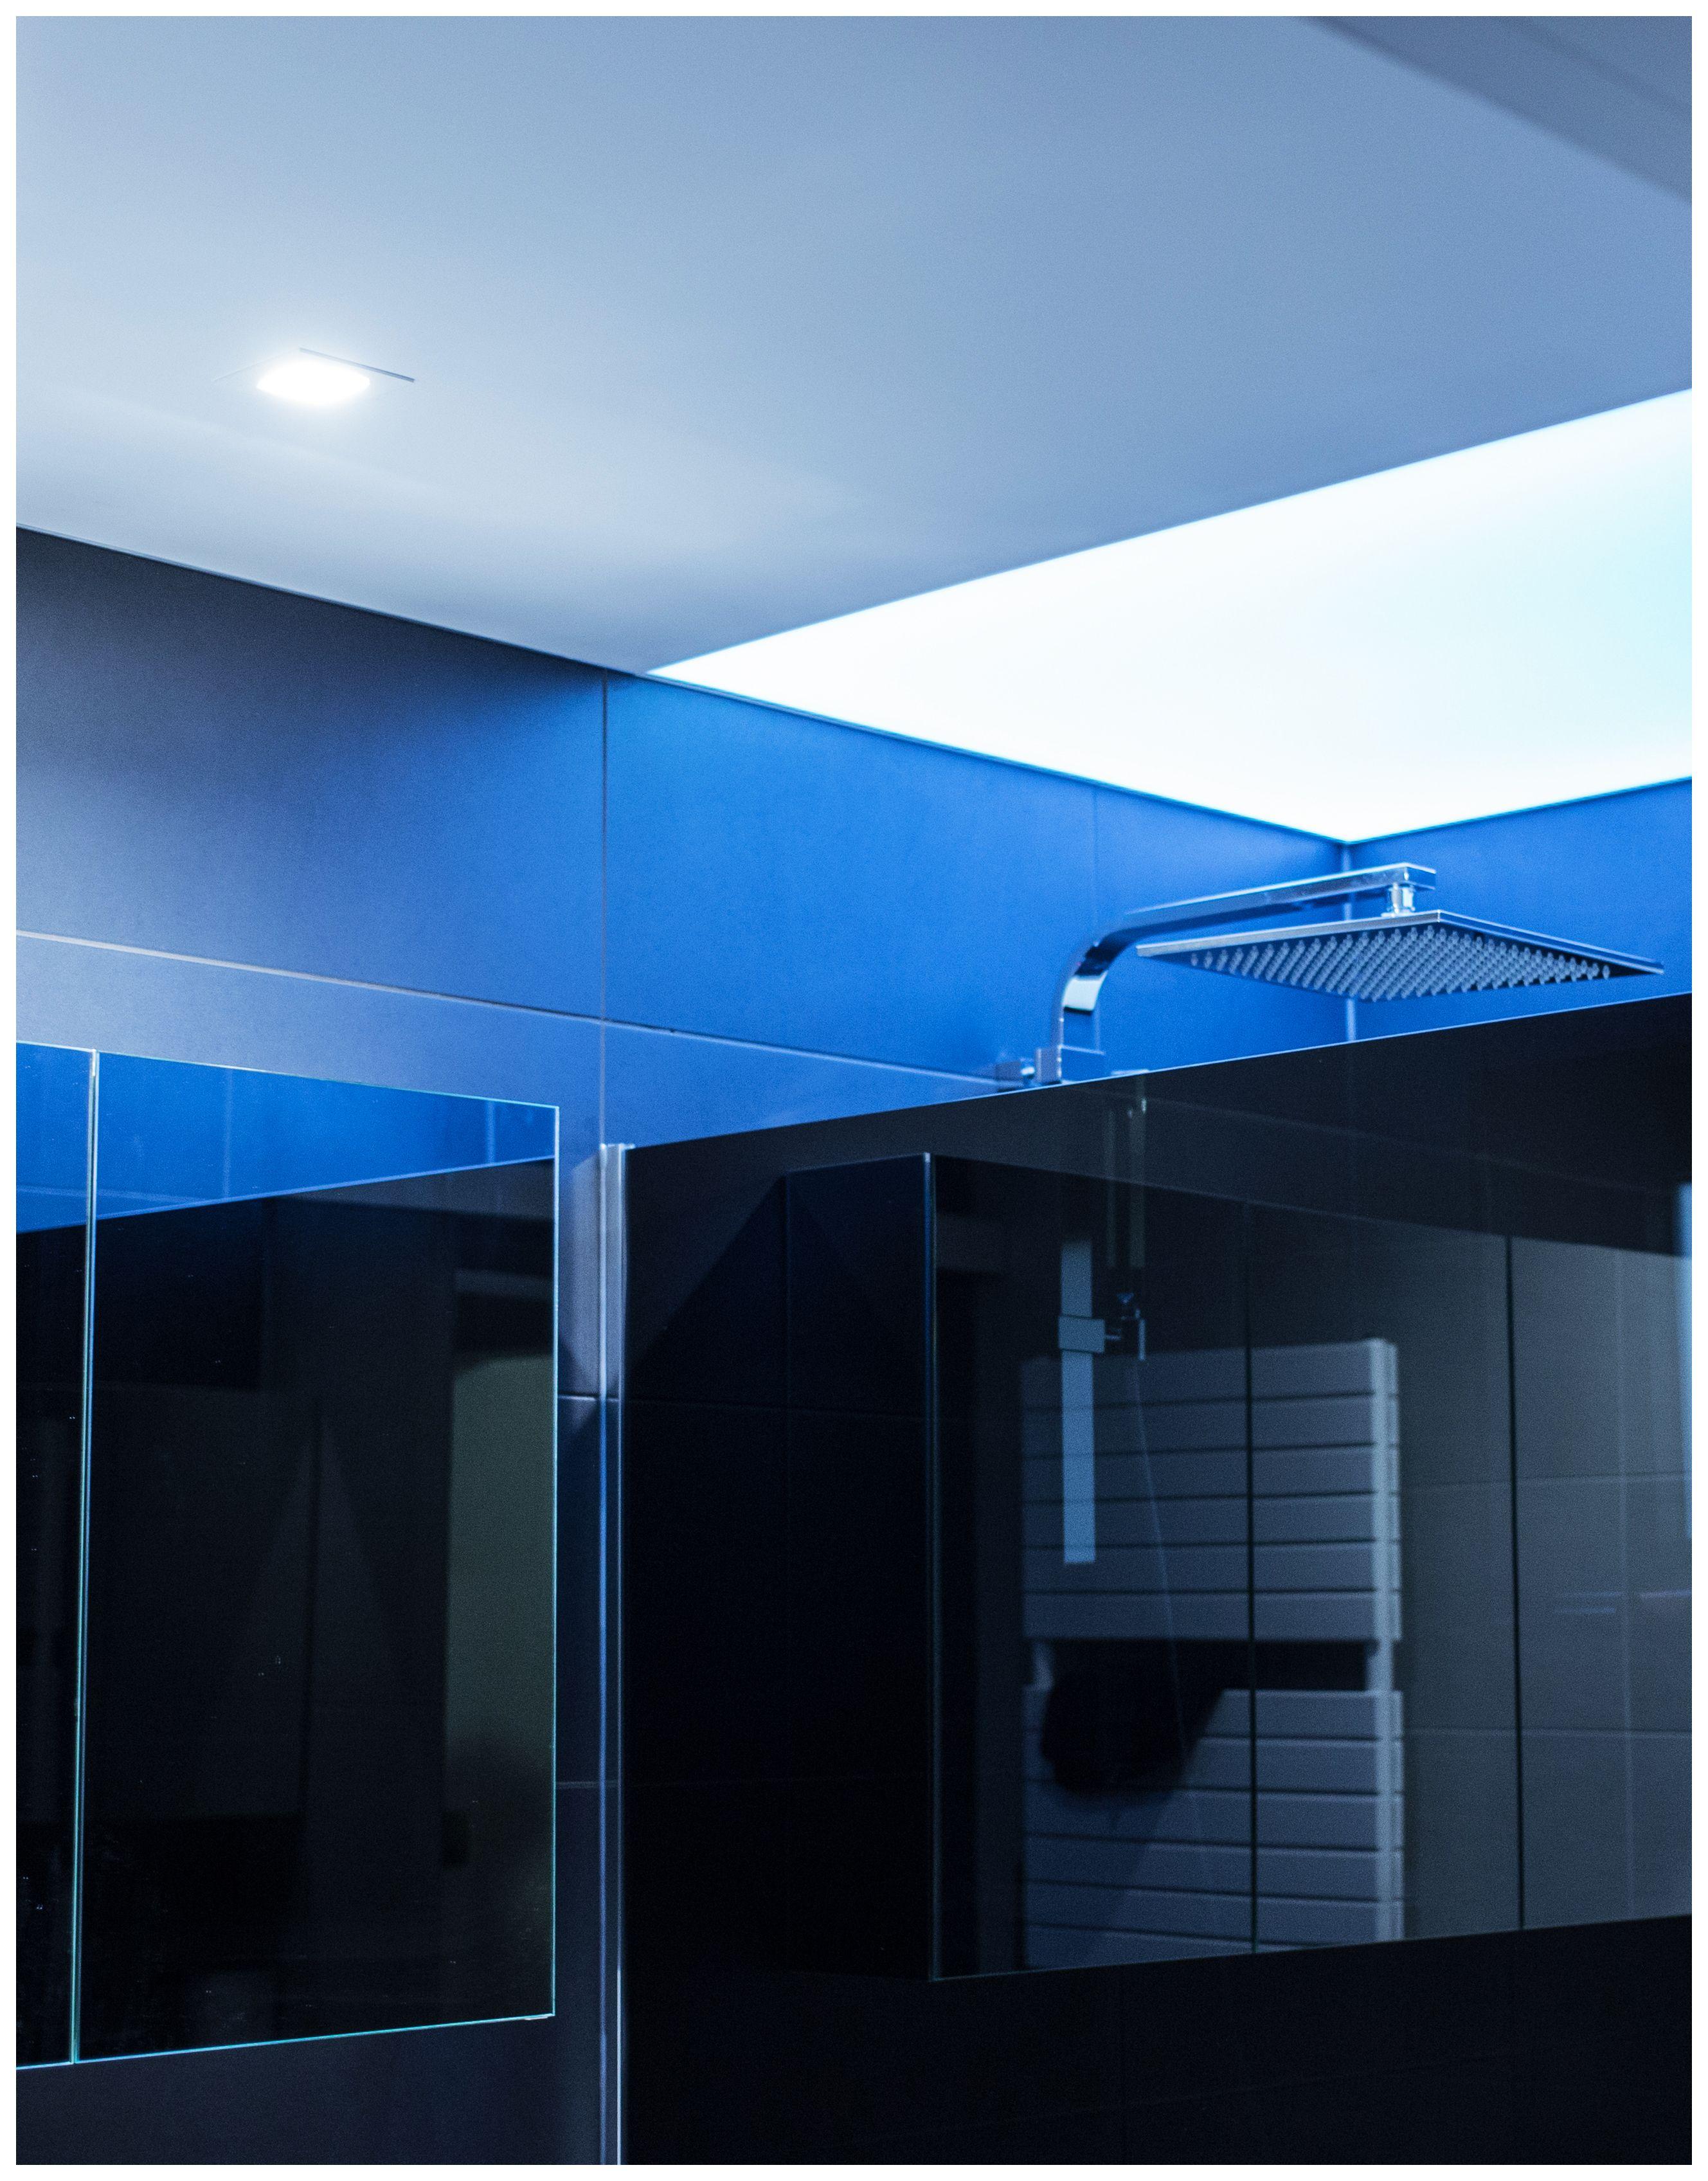 lichtplafond spanplafond in badkamer boven de douche spanplafond